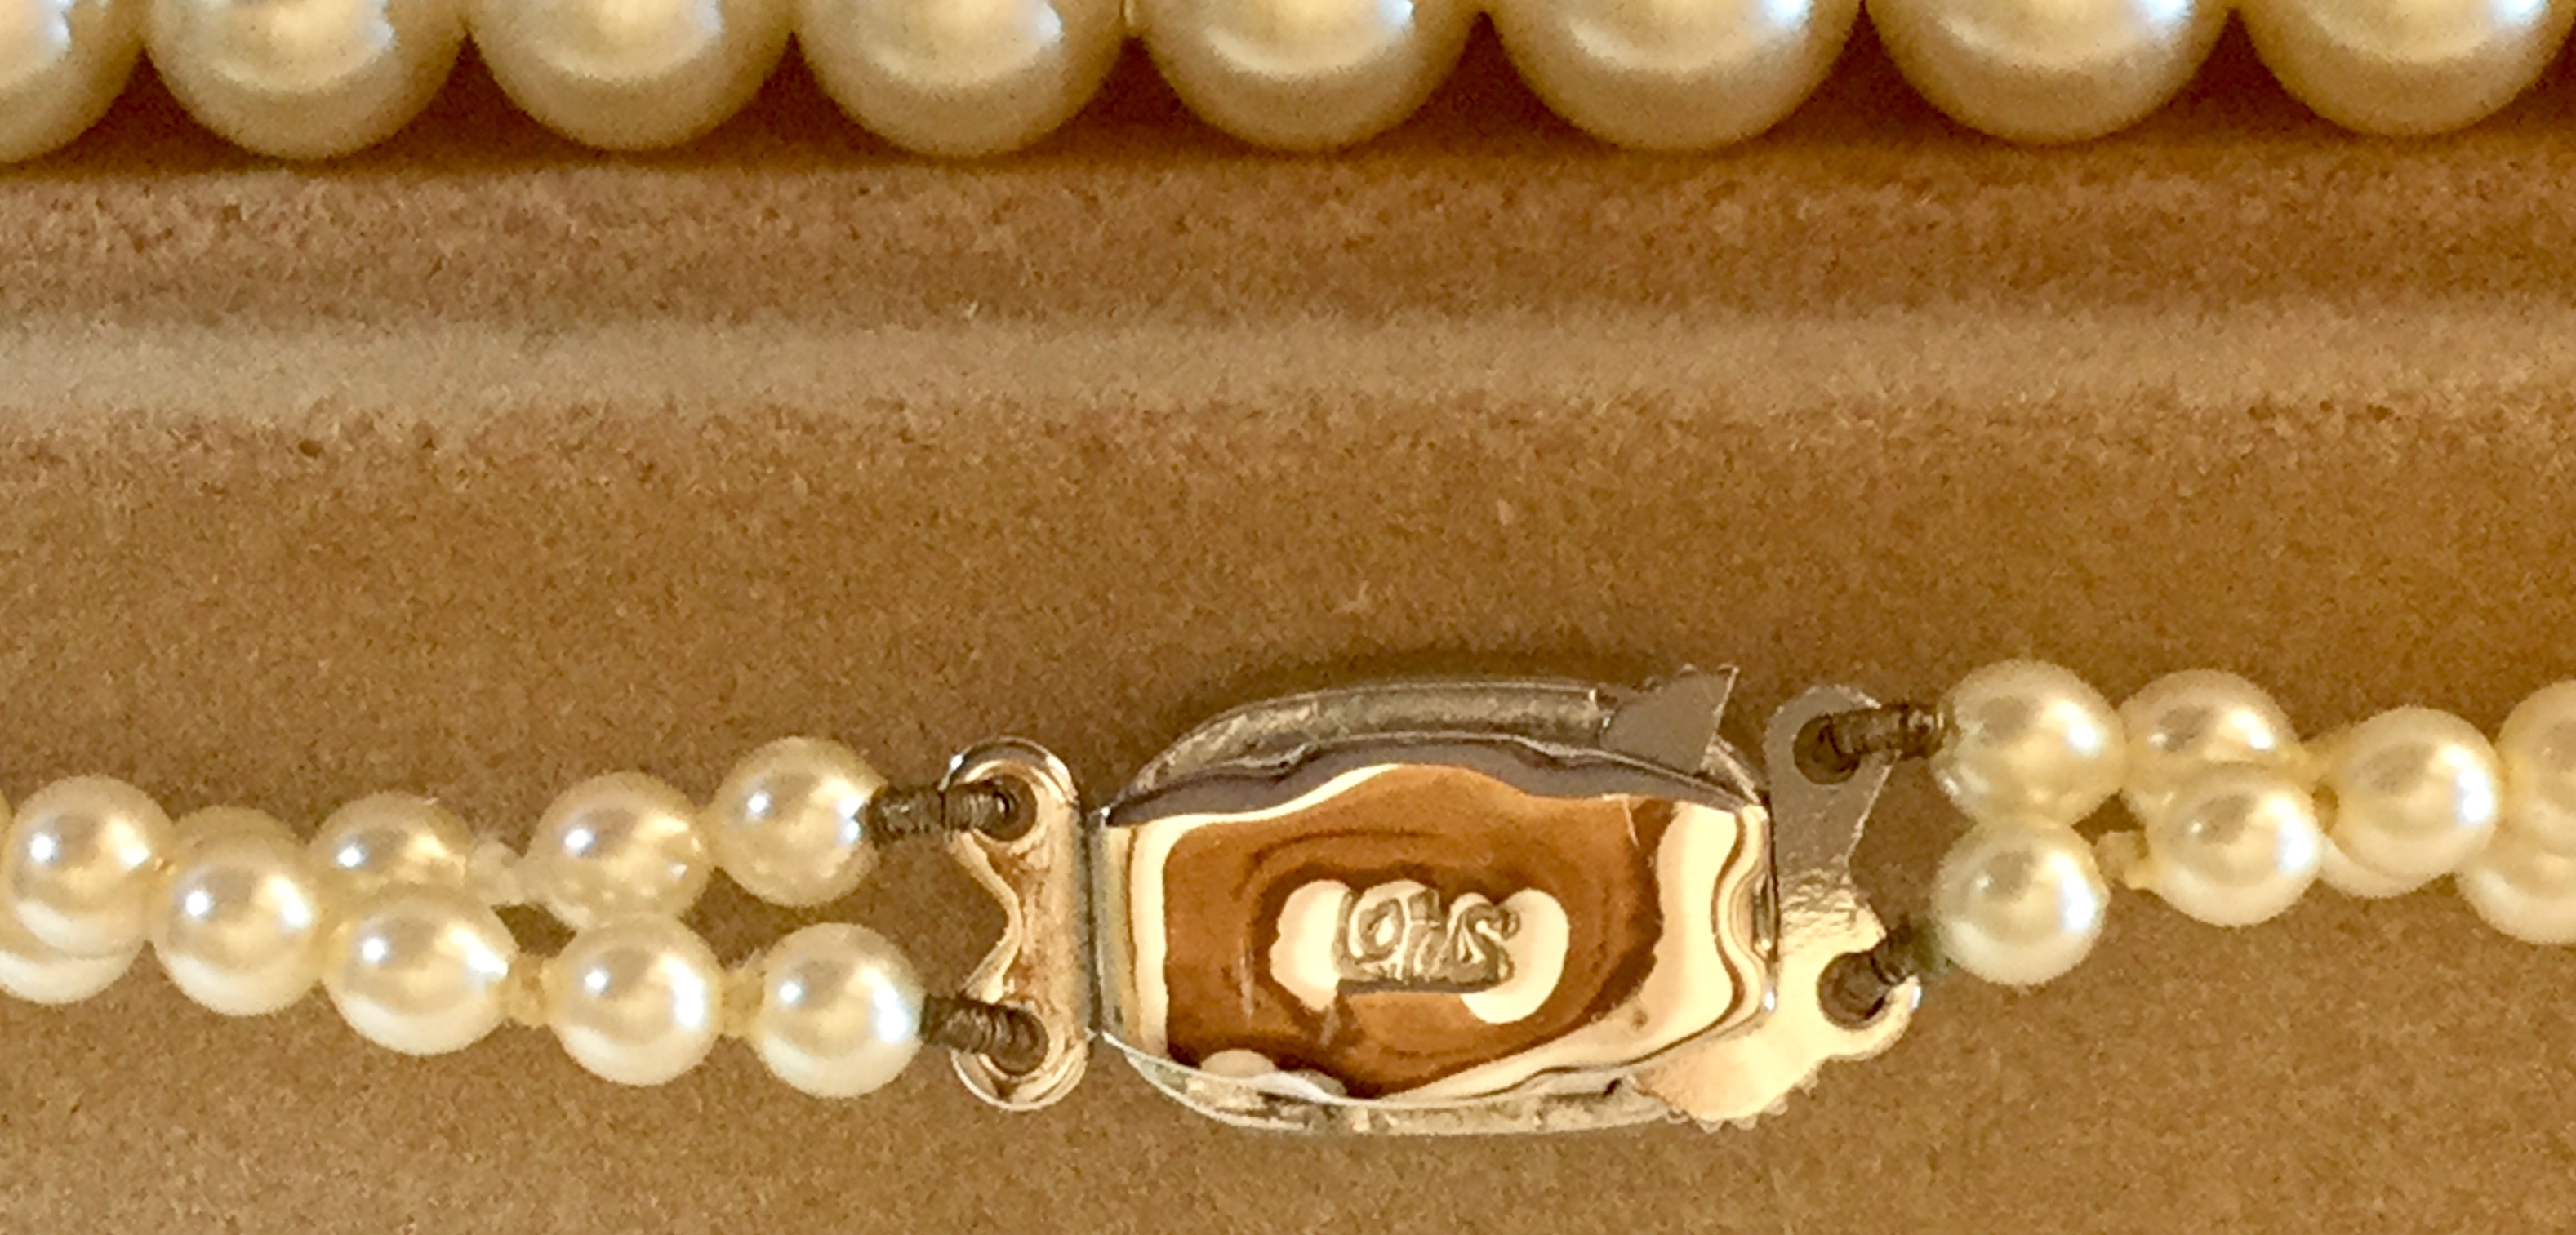 "Vintage Lotus Double row 18"" Pearls Diamanté Clasp marked Lotus for bride wedding - Image 5 of 5"